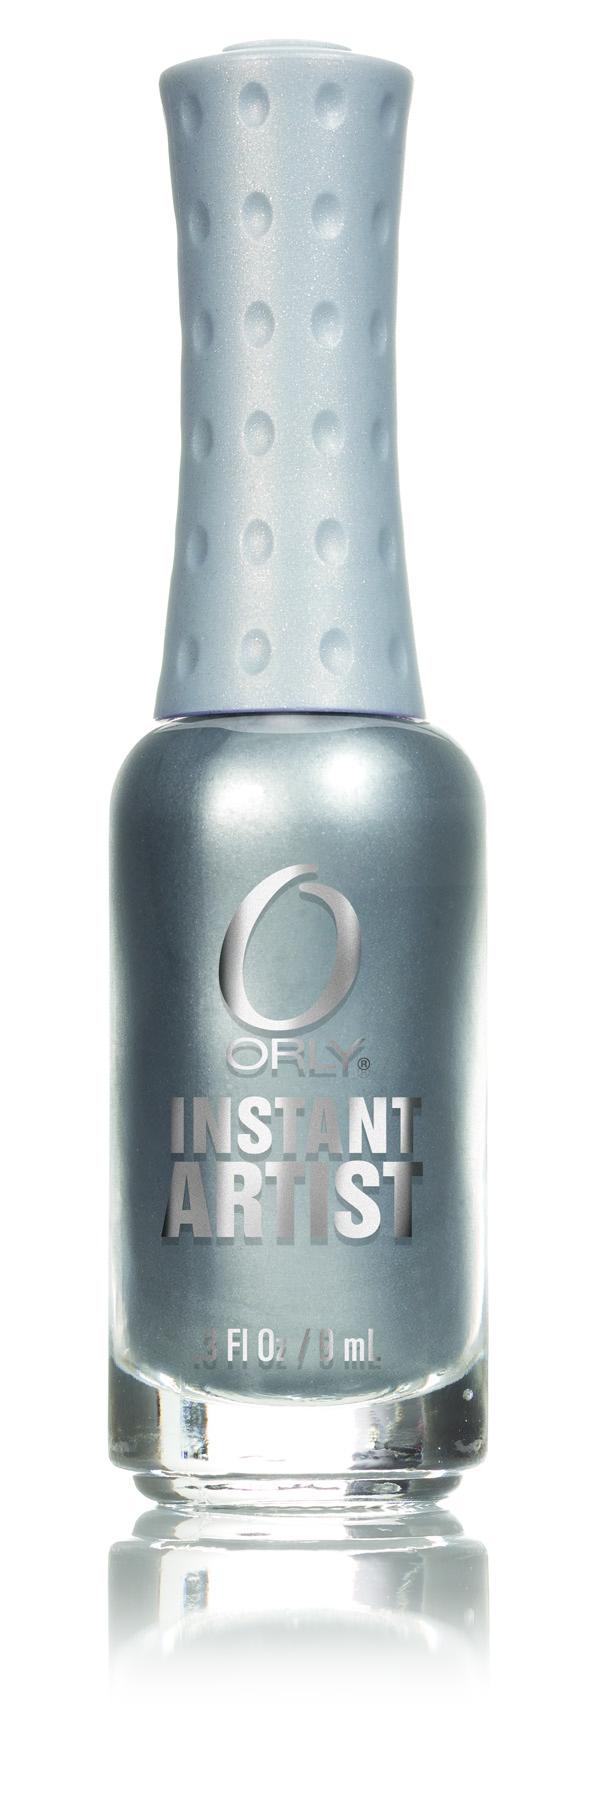 ORLY Краска для дизайна ногтей 10 Platinum / Instant Artist 9мл